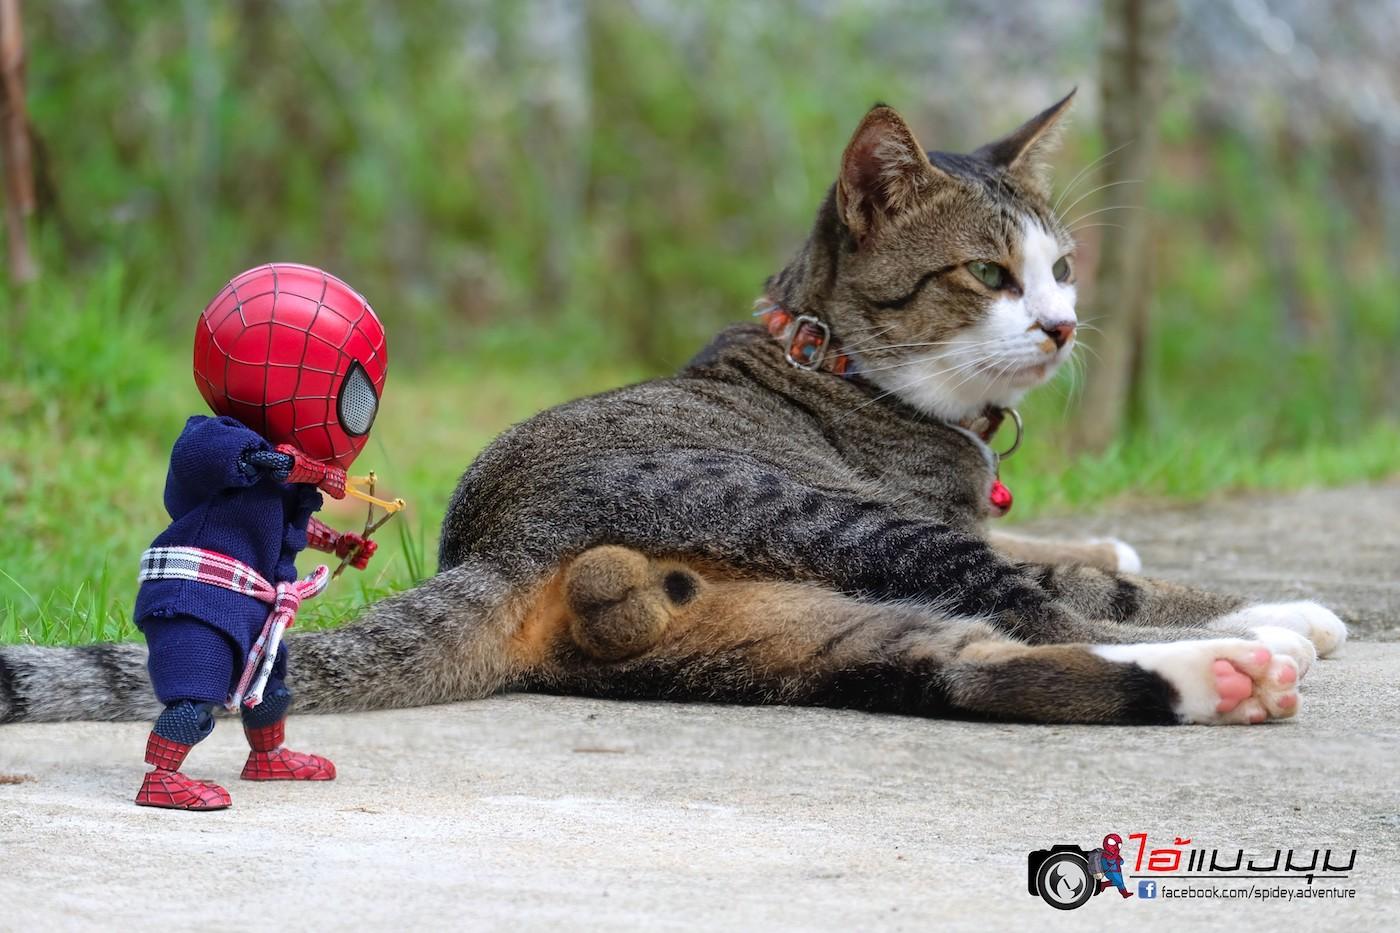 https://i1.wp.com/creapills.com/wp-content/uploads/2019/11/figurine-spiderman-chat-23.jpg?w=1400&ssl=1